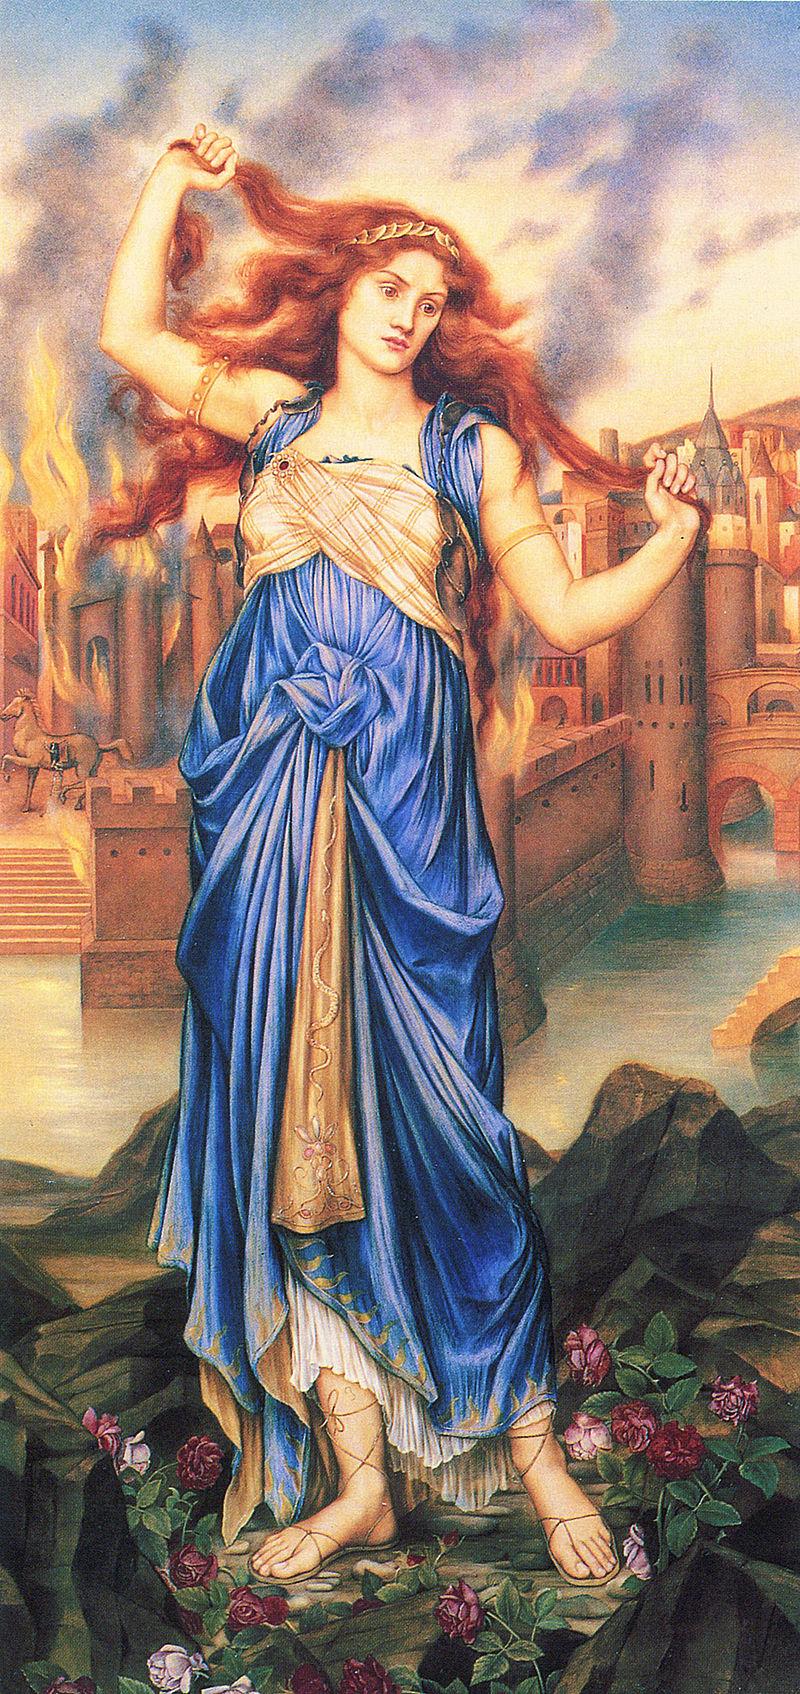 Кассандра, называемая также Александра. Картина Эвелин де Морган (1898)